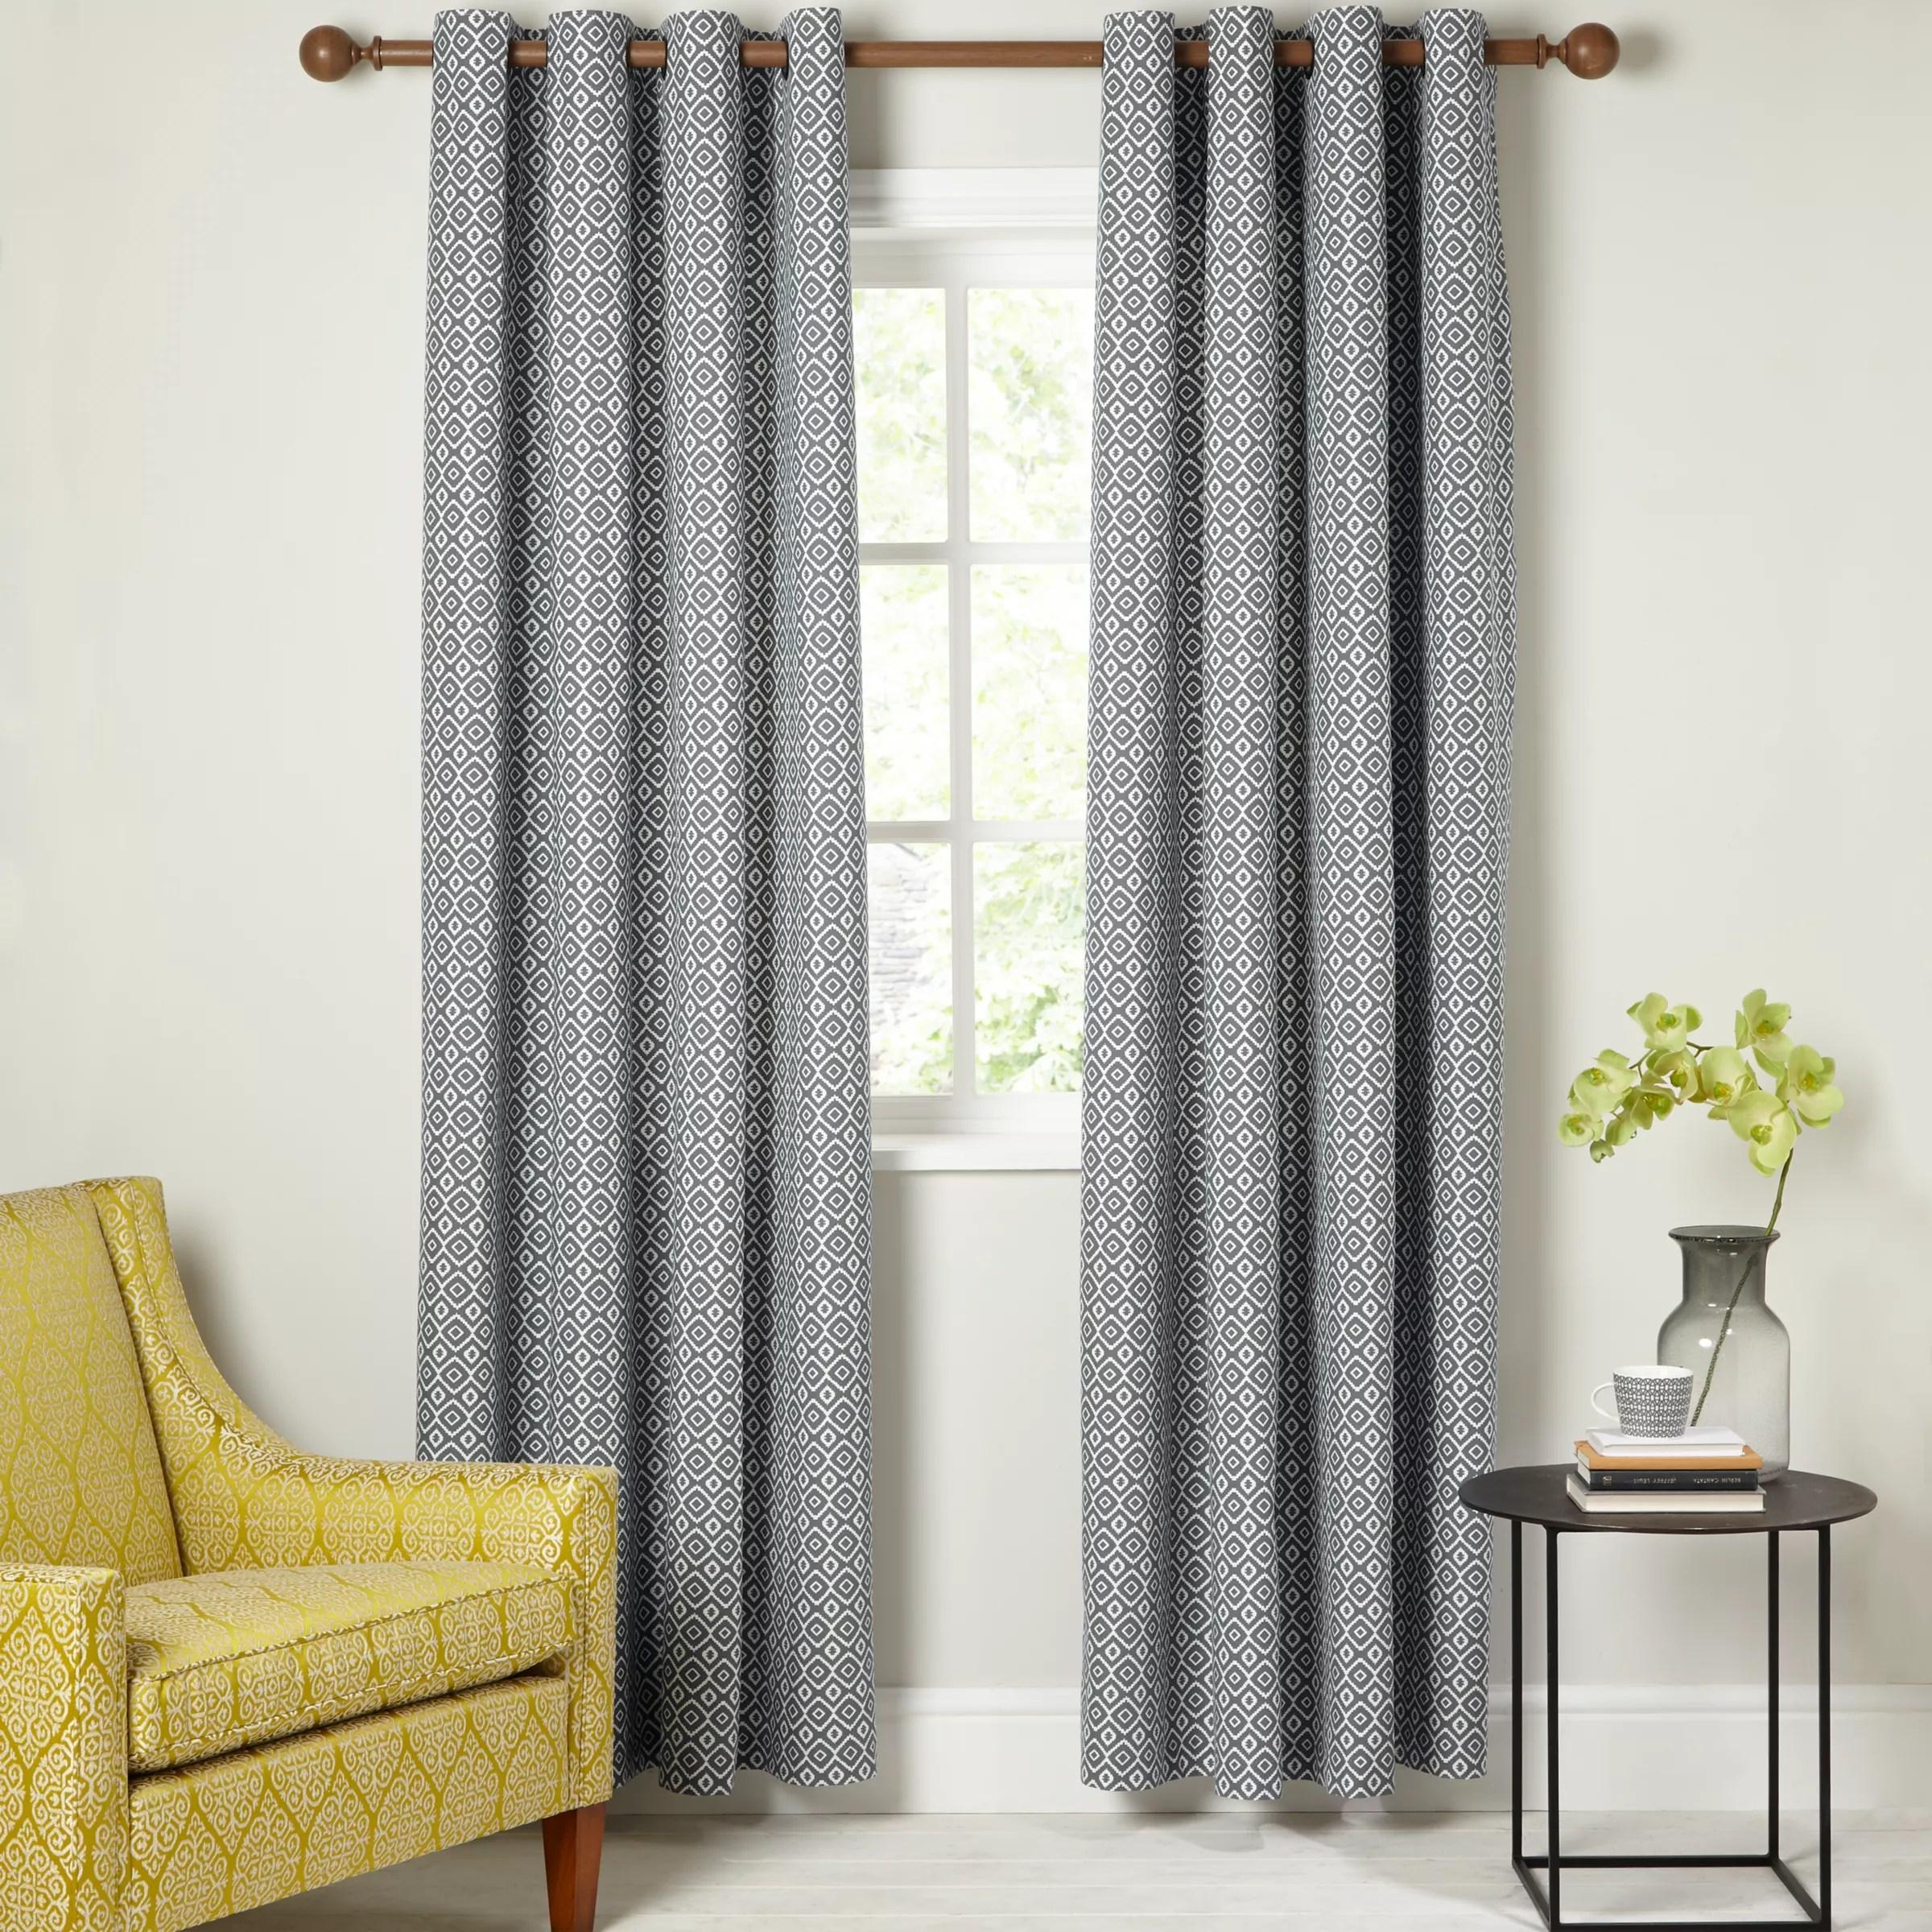 buy john lewis nazca lined eyelet curtains online at johnlewis com